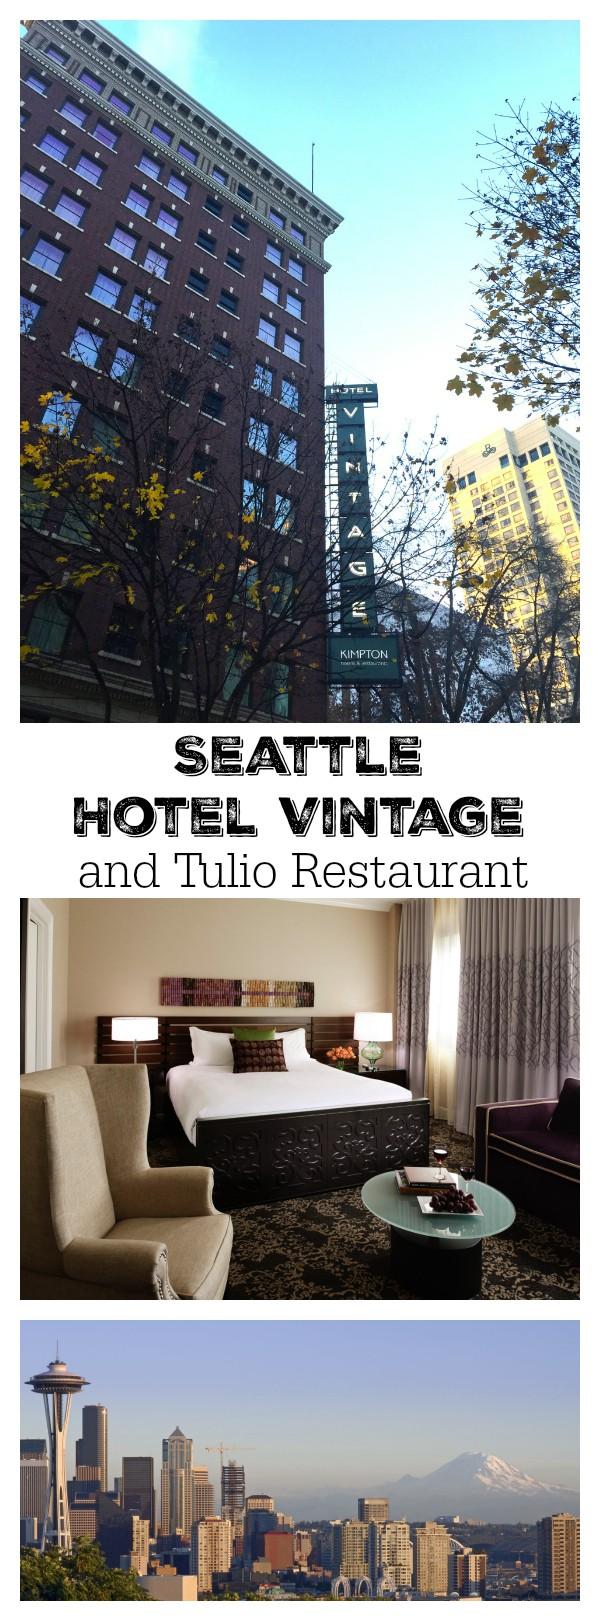 Seattle Hotel Vintage and Tulio Restaurant